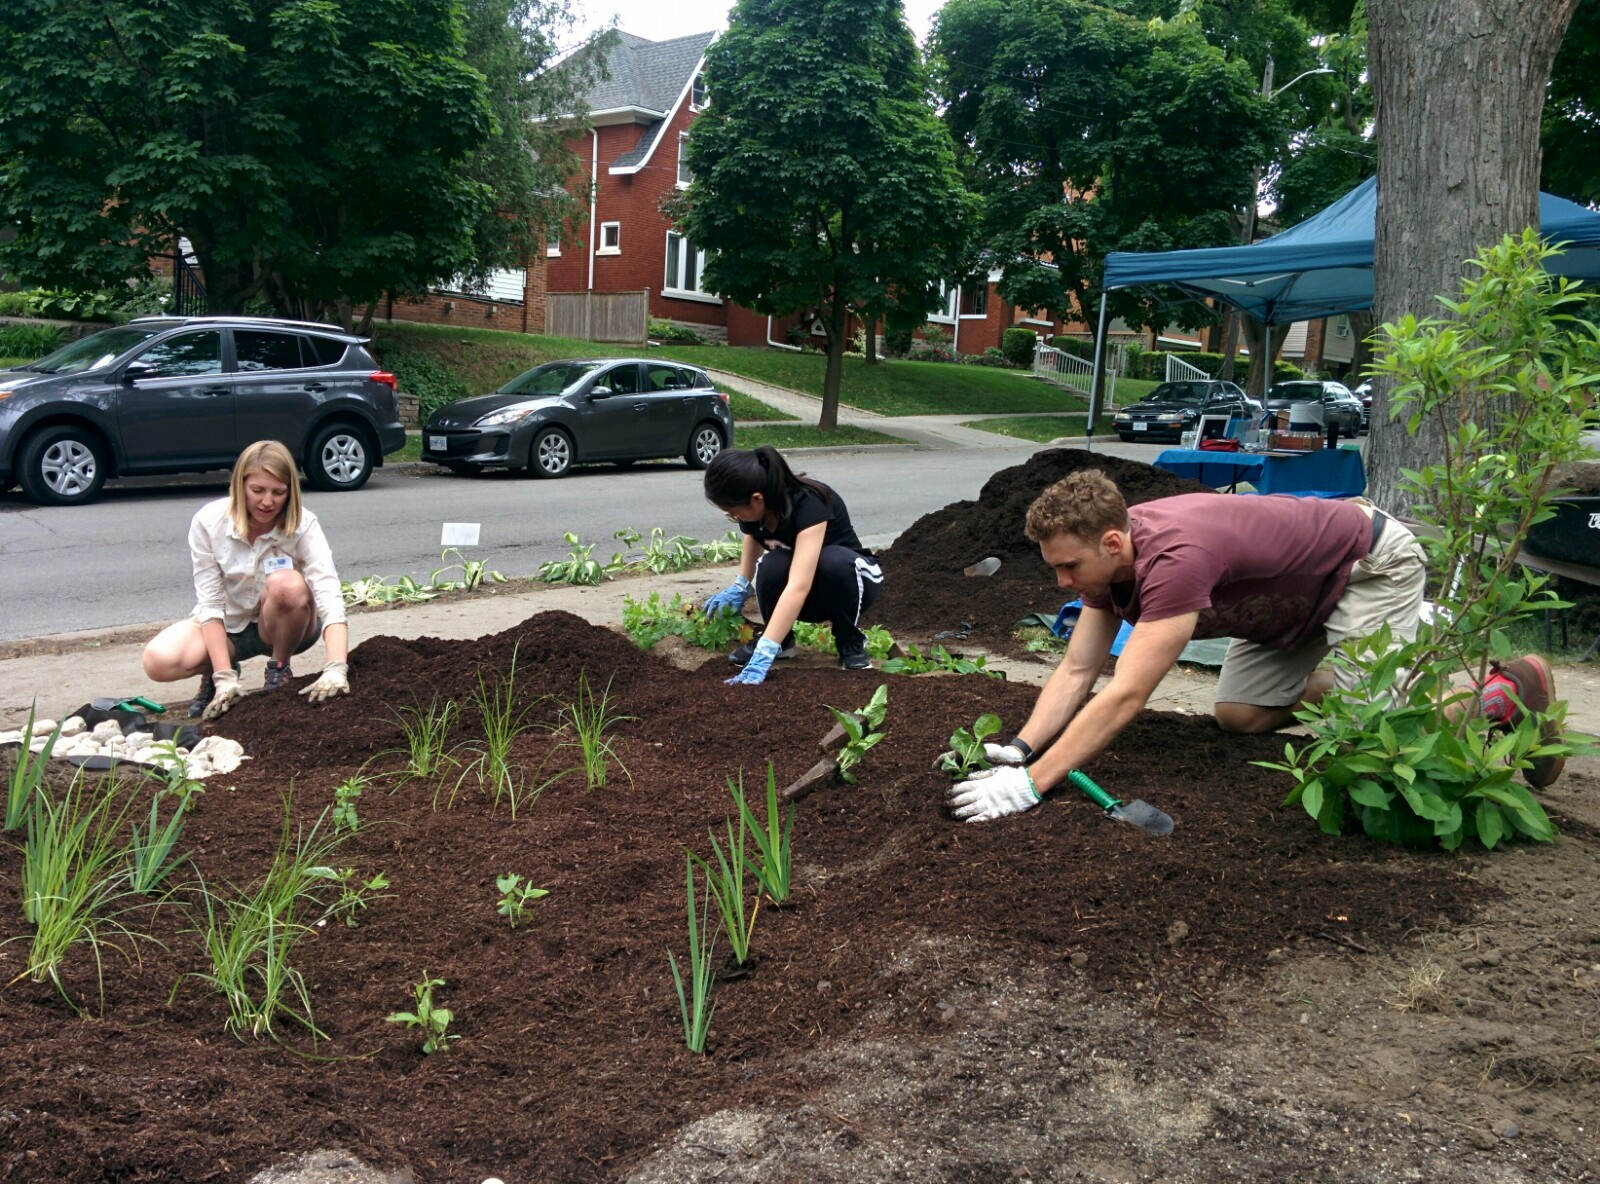 rain garden work party, gardeners planting